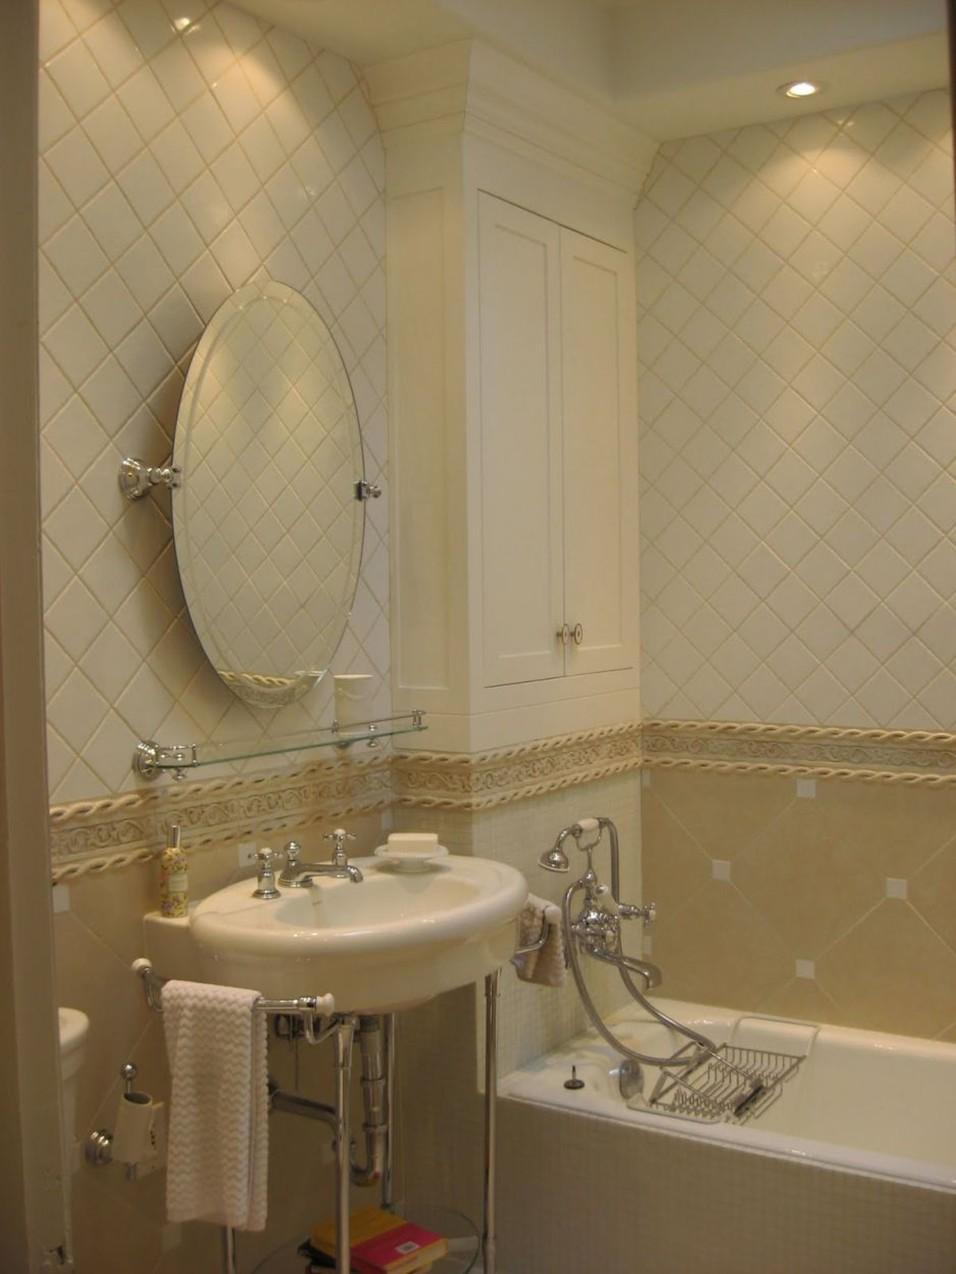 small-bathroom-fascinating-small-bathroom-designs-ikea-new-small-bathroom-designs-small-bathroom-designs-new-zealand-small-bathroom-designs-youtube-small-bathroom-designs-with-shower-small-bathr